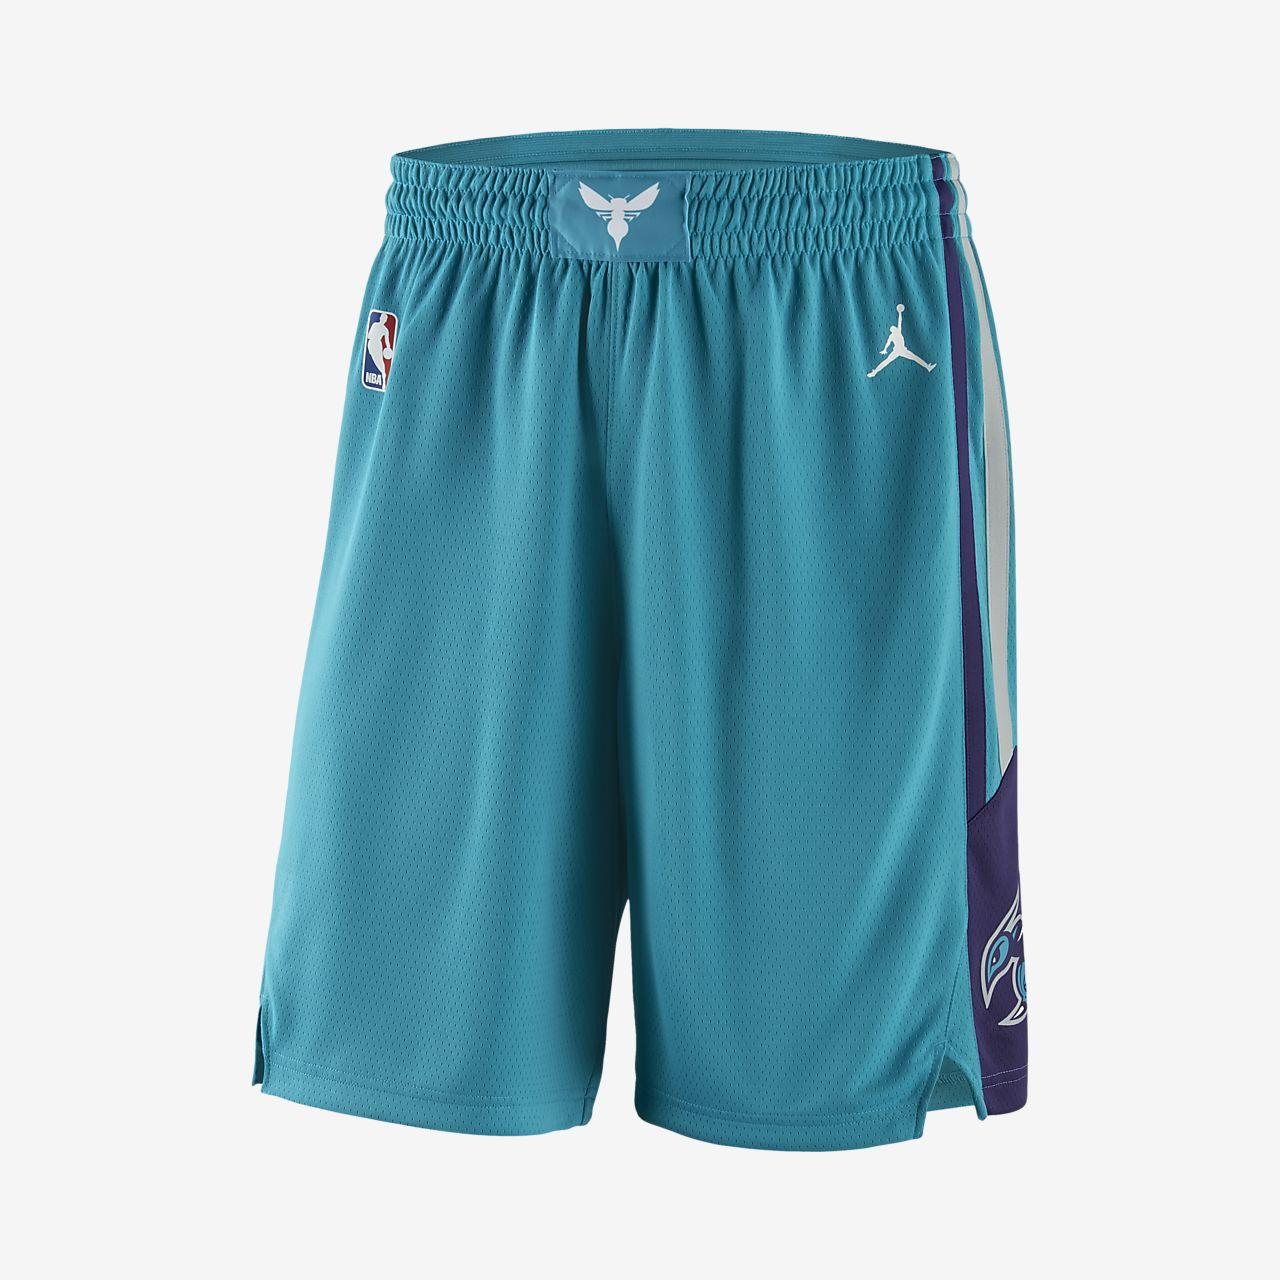 Calções NBA Charlotte Hornets Jordan Icon Edition Swingman para homem